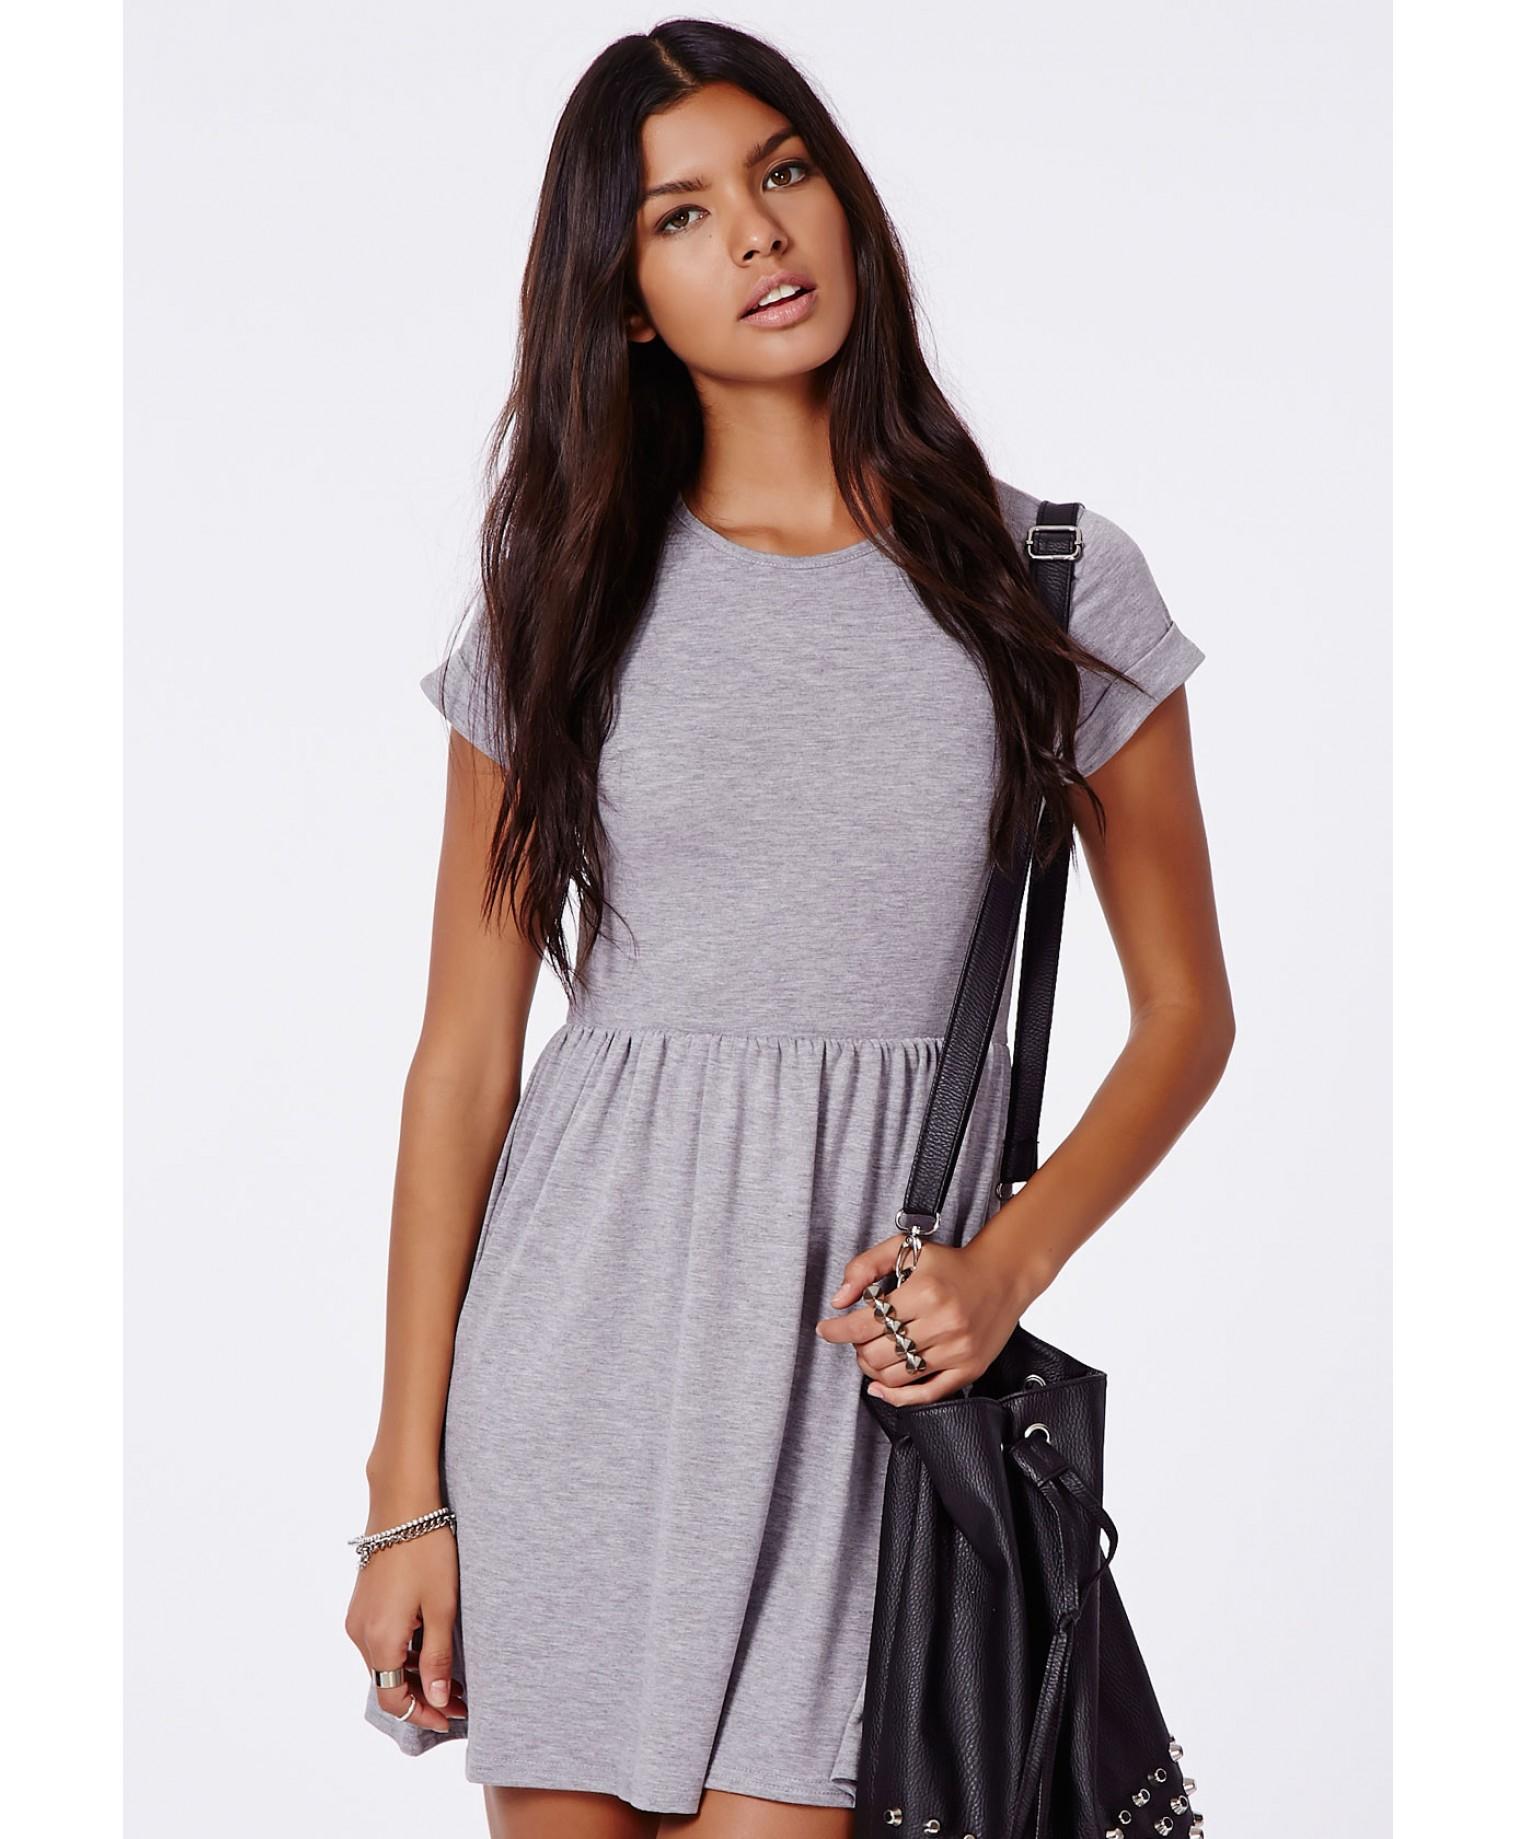 437307bb611d Lyst - Missguided Aliveta T-Shirt Skater Dress in Gray